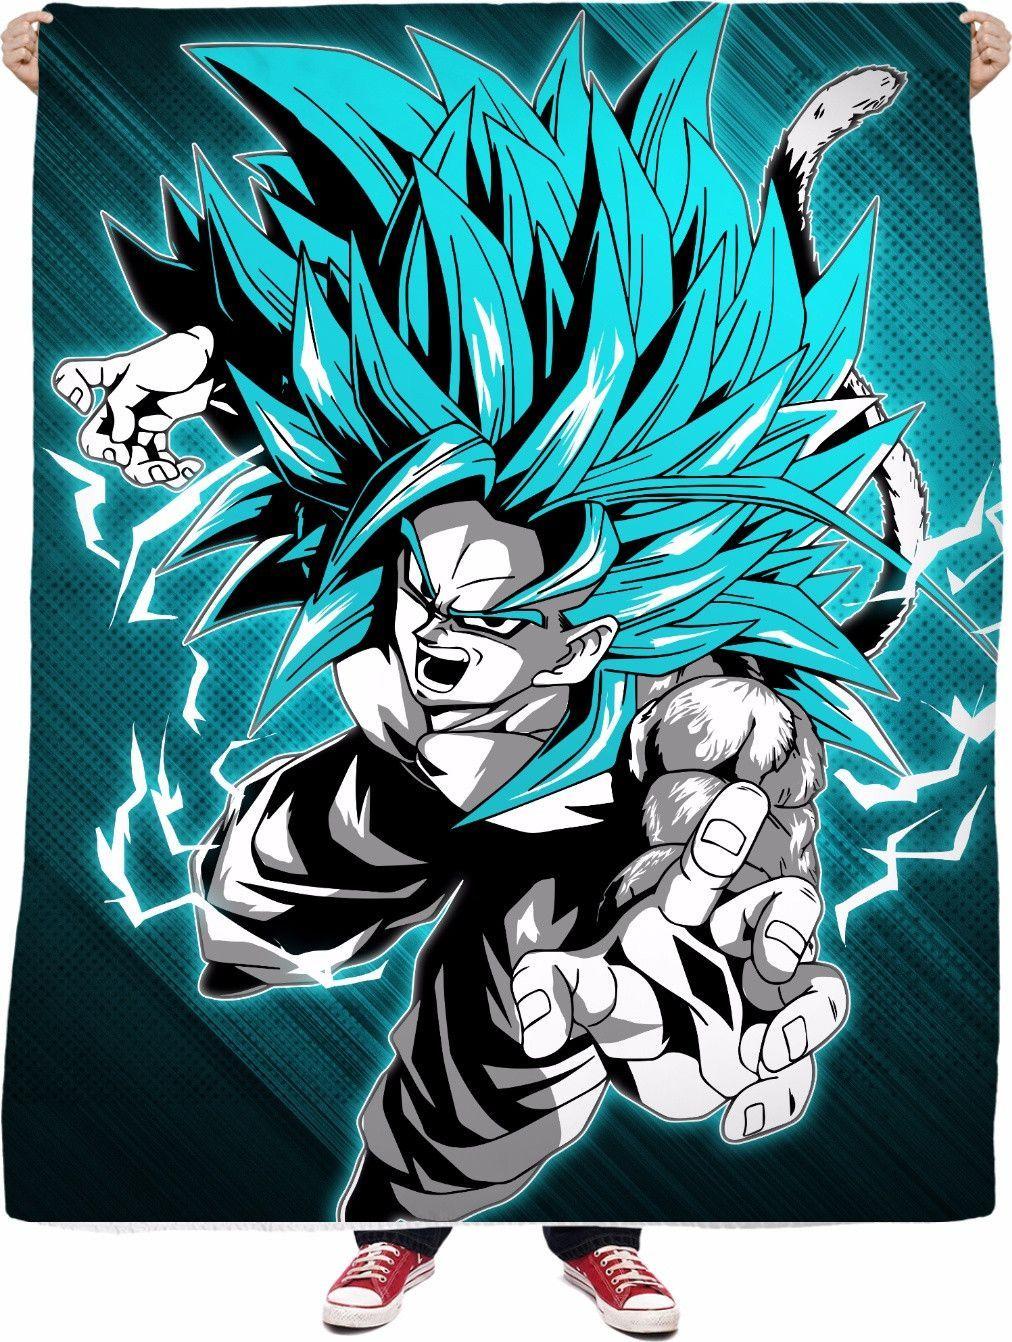 Super Saiyan - Goku SSj 5 - Limited Fleece Blanket ...